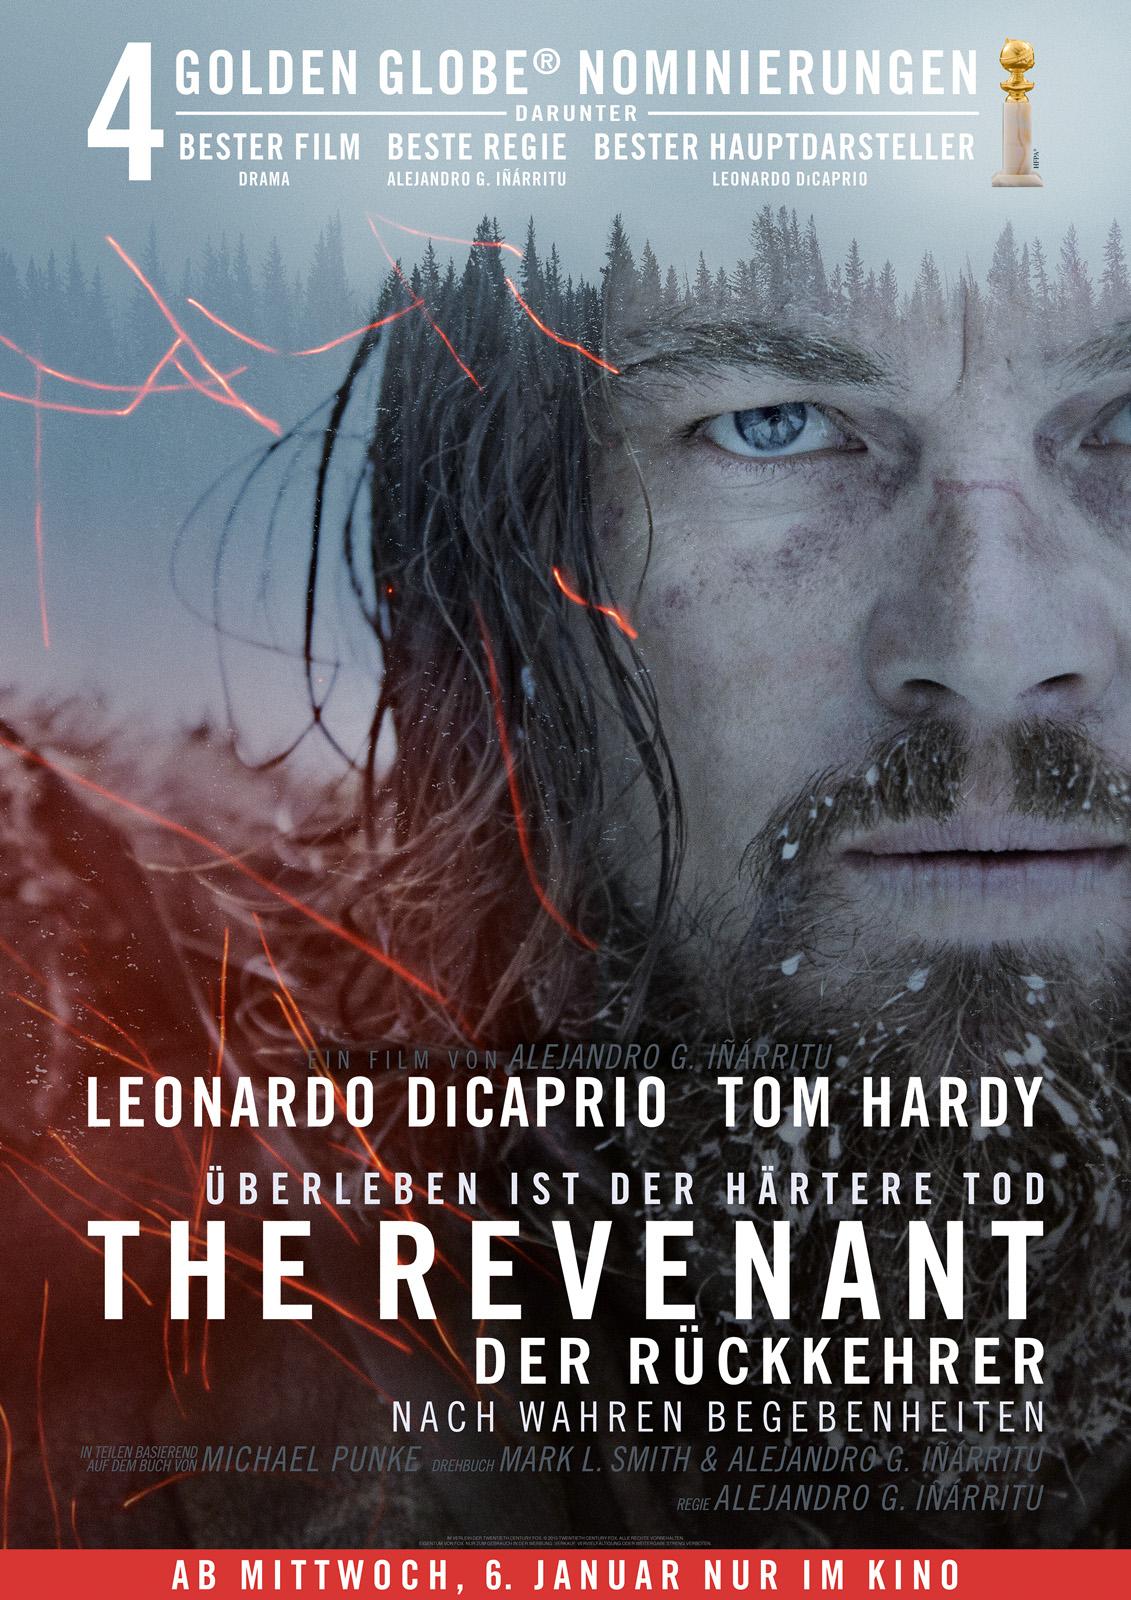 the revenant – der rückkehrer stream